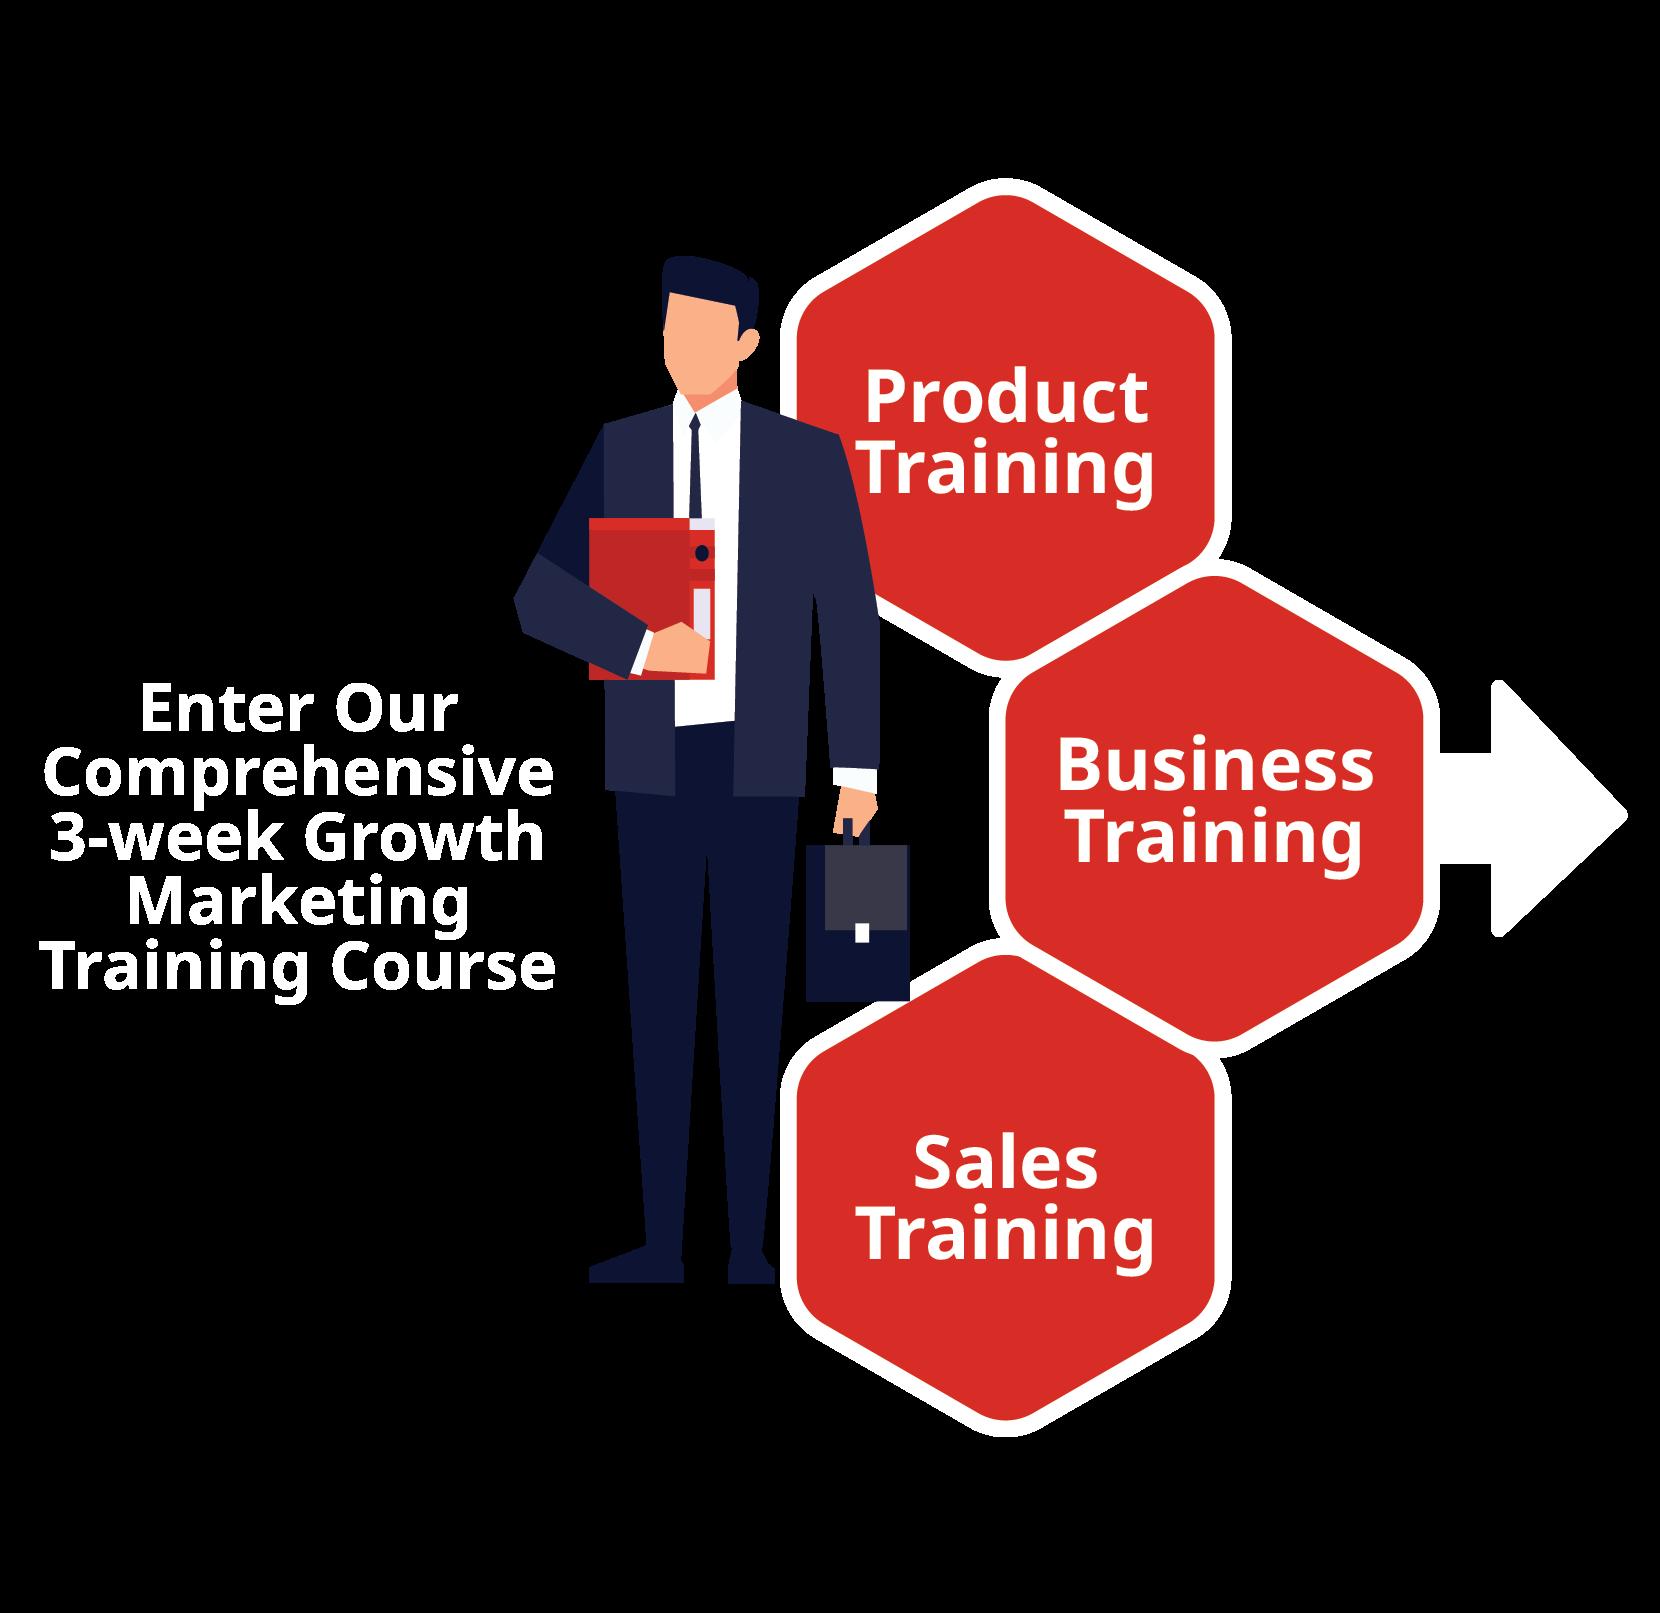 marketing agent image